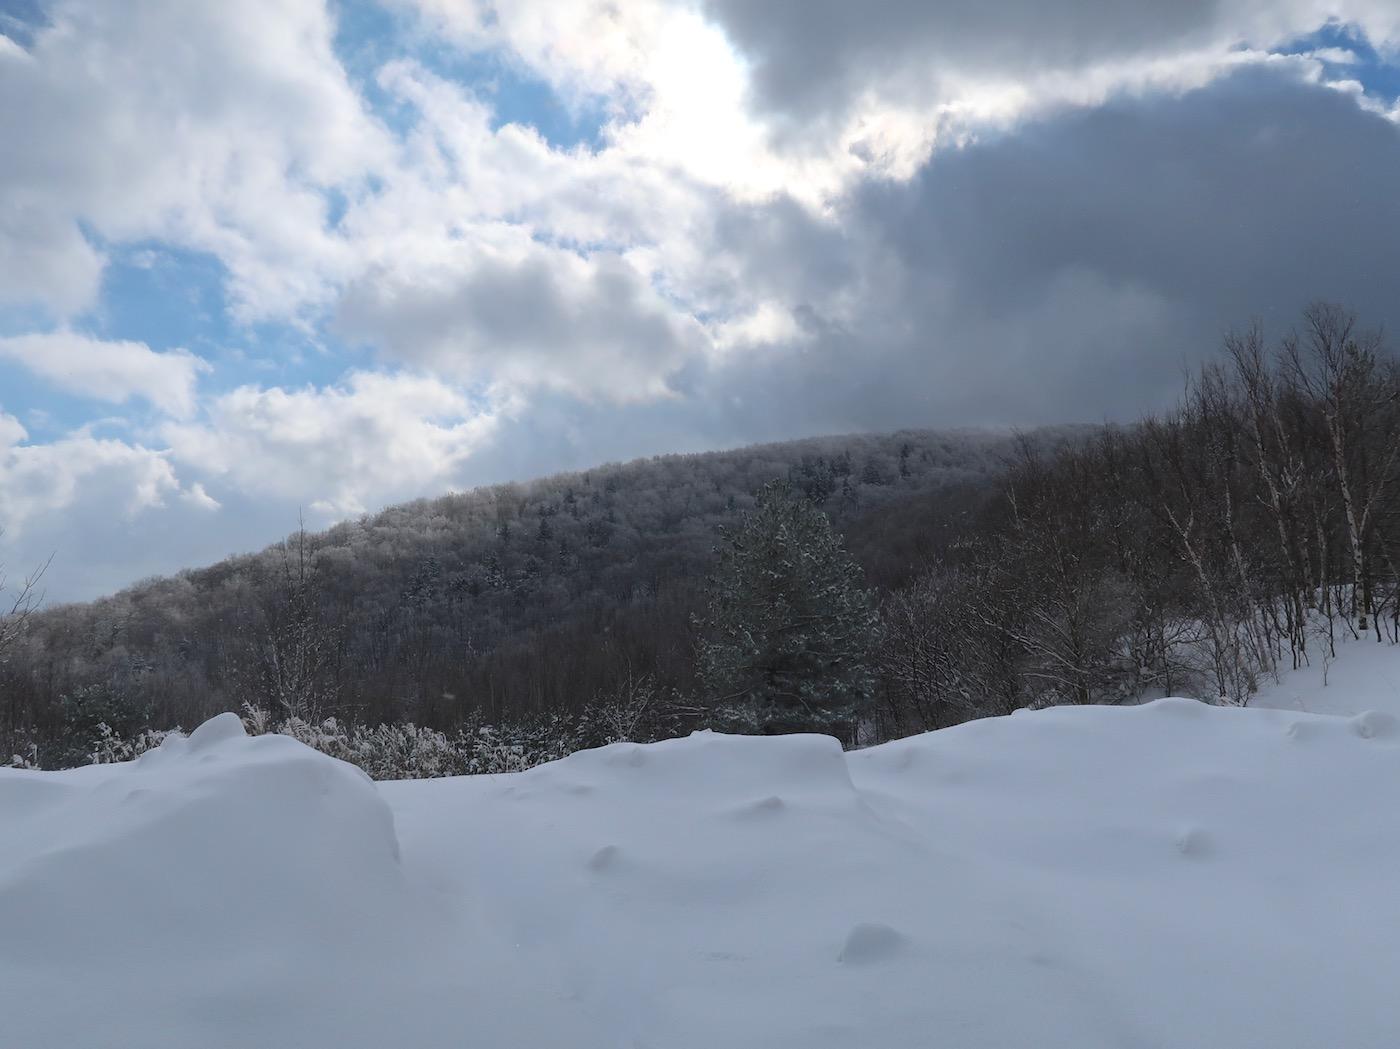 Mount Raimer